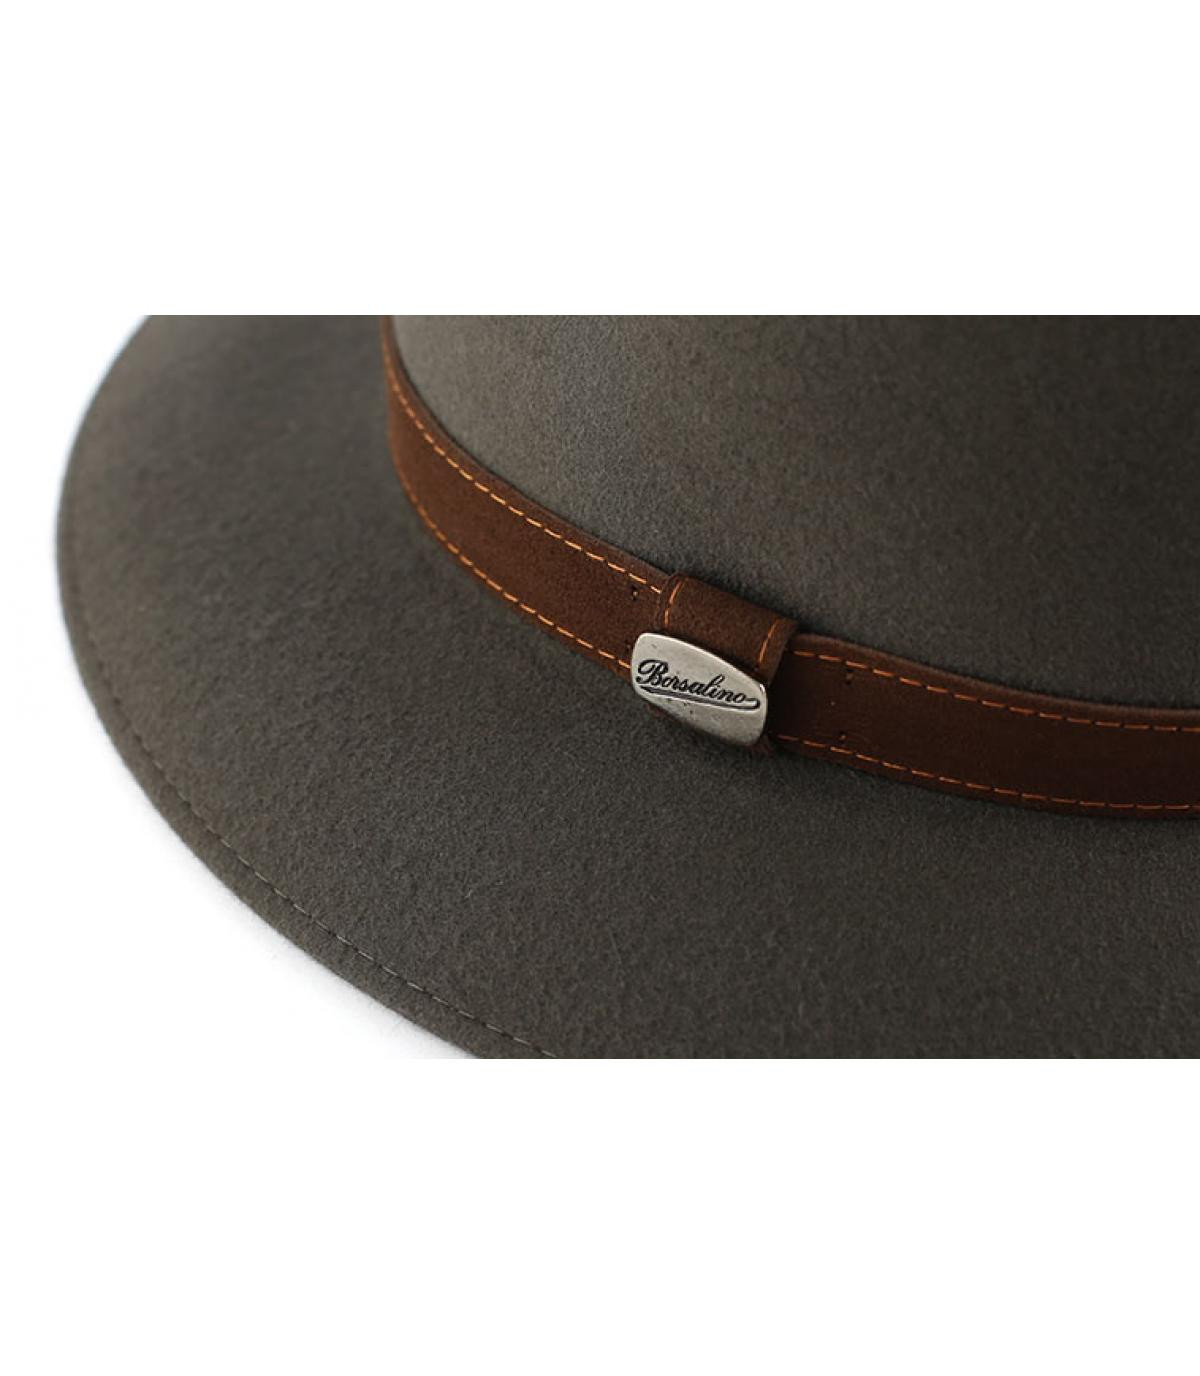 Details Alessandria grey fur felt hat - Abbildung 2